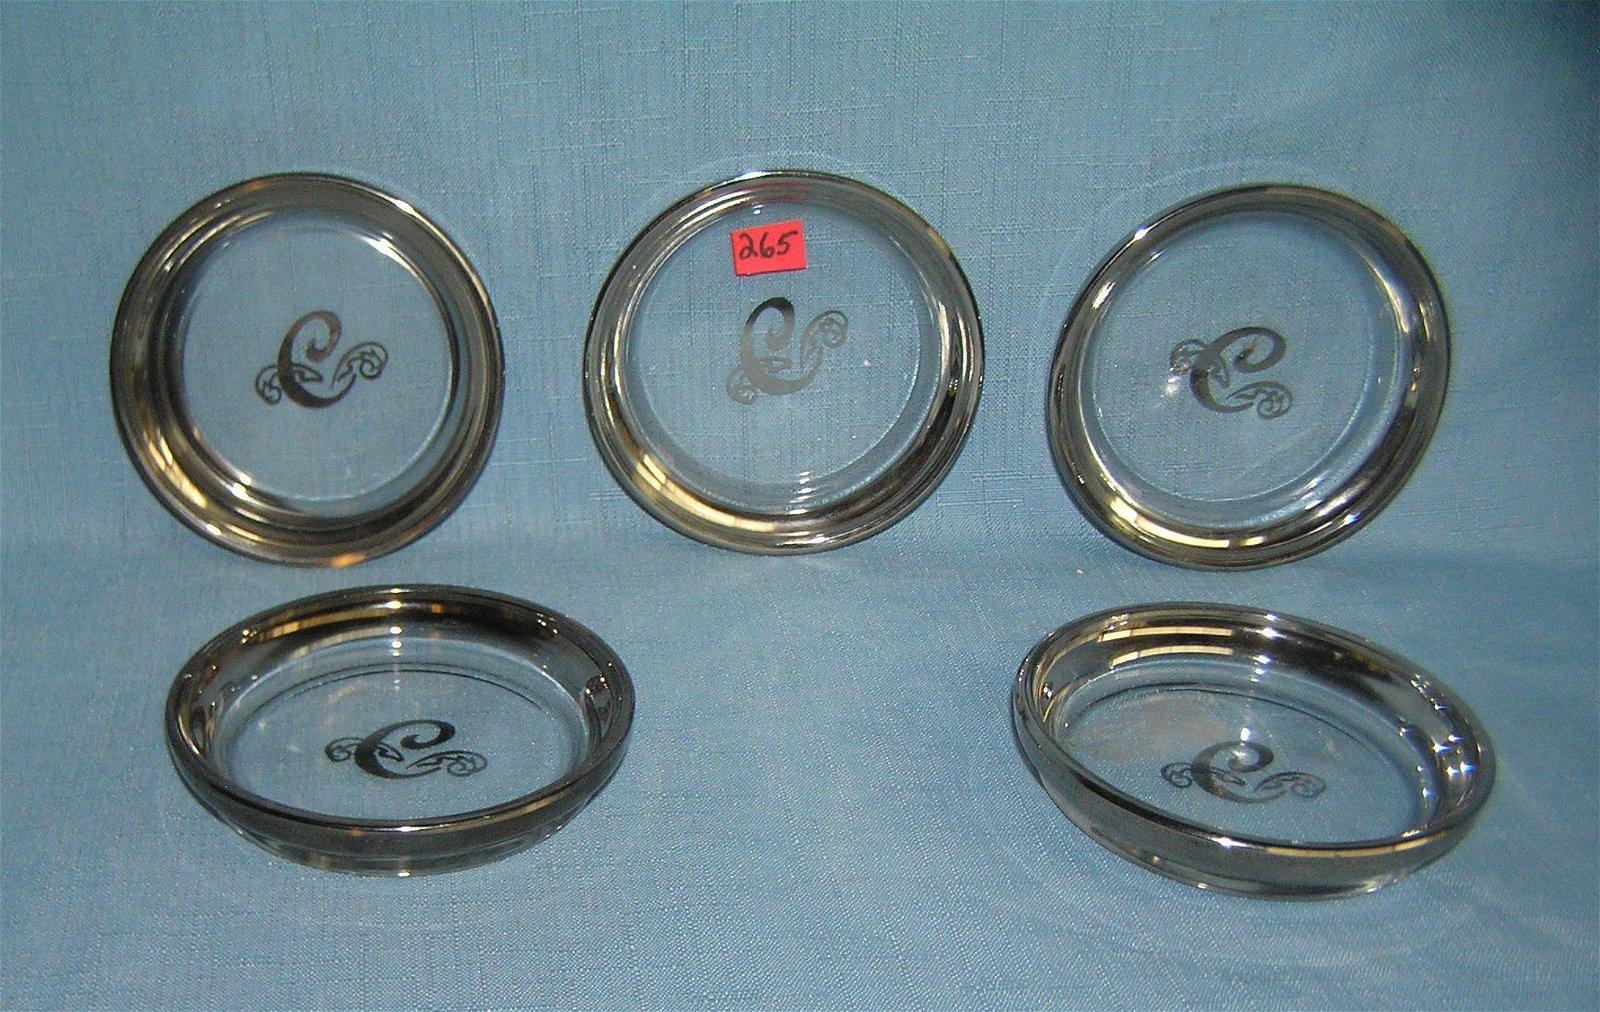 Silver overlay on glass 5 piece vintage coaster set